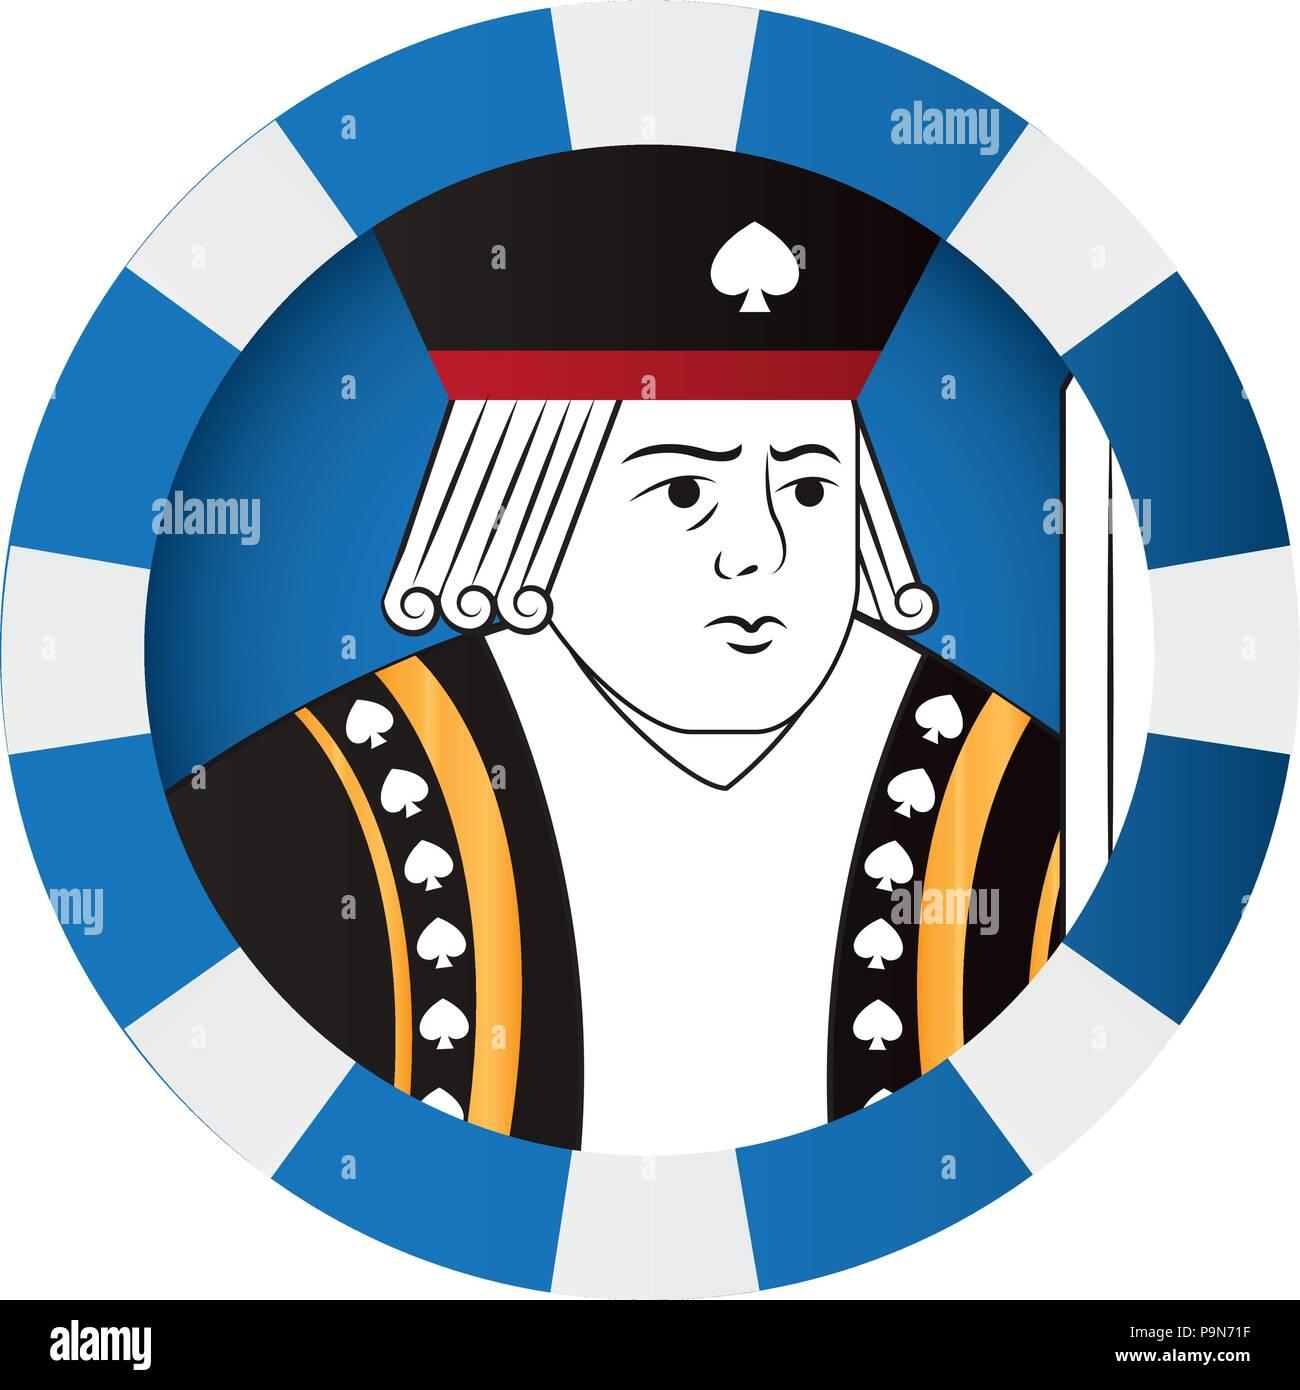 King Symbol Poker Card Game Stock Vector Image Art Alamy